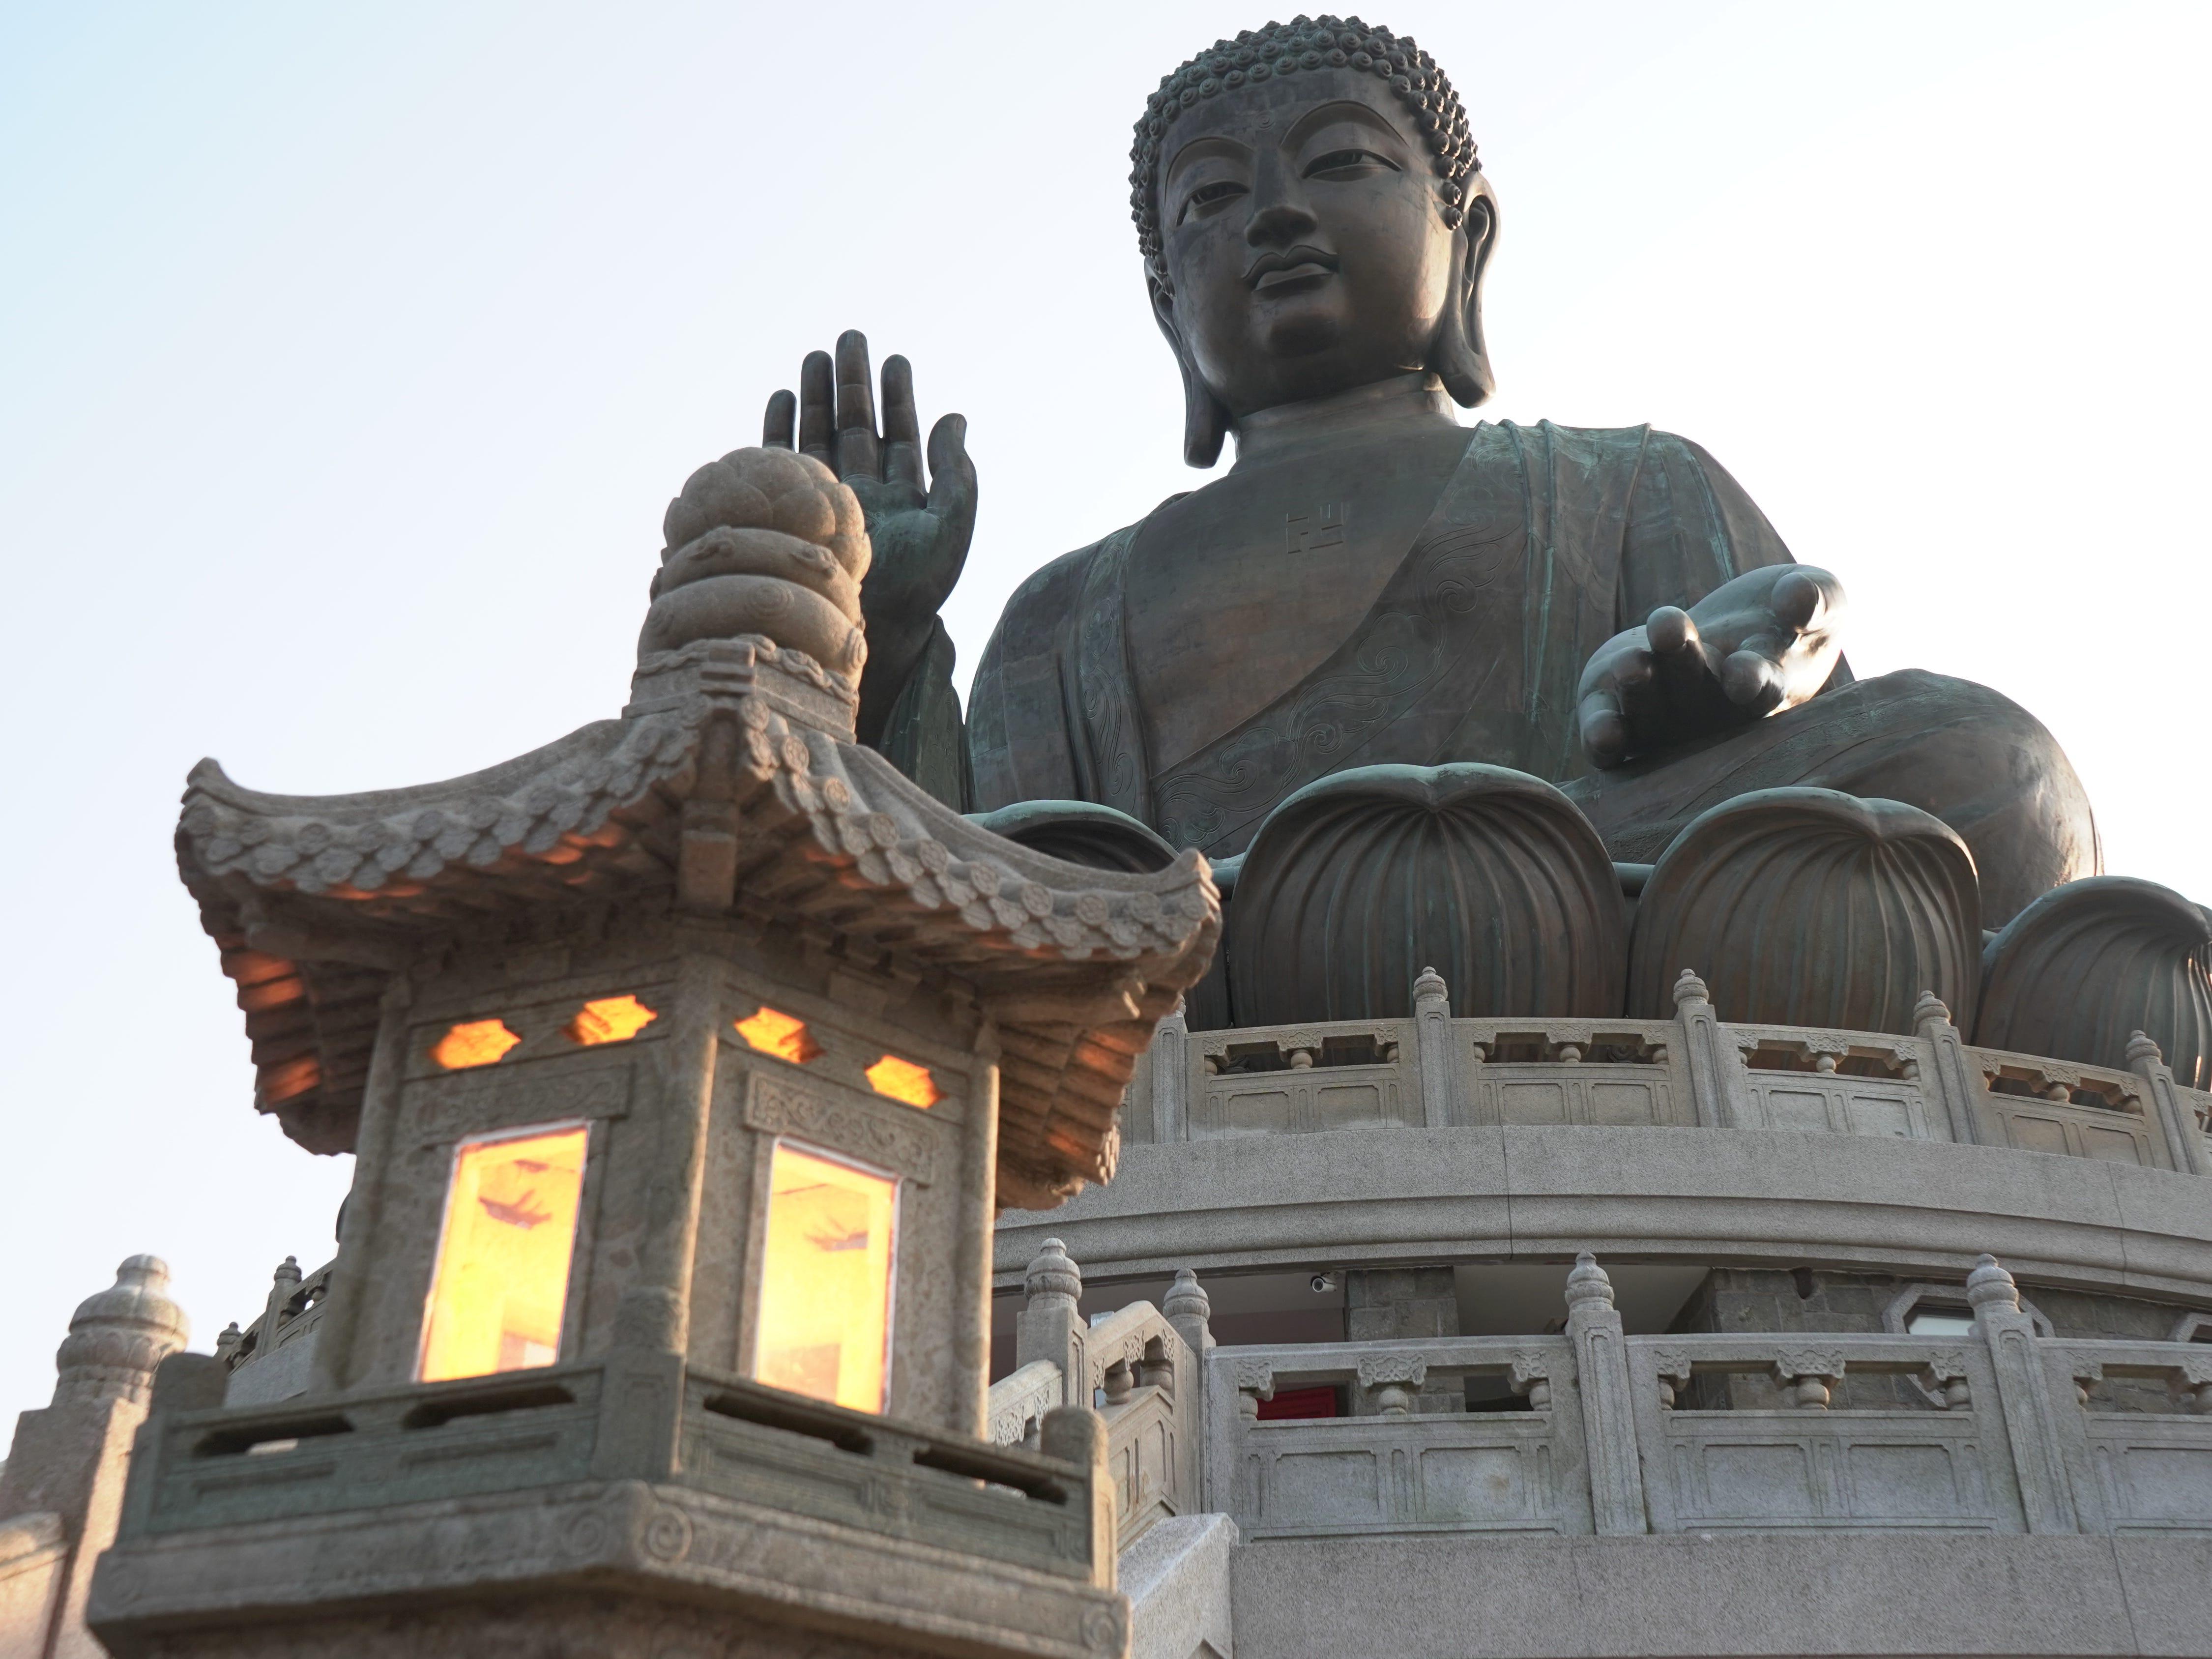 The Big Buddha, high atop his perch on Lantau Island.